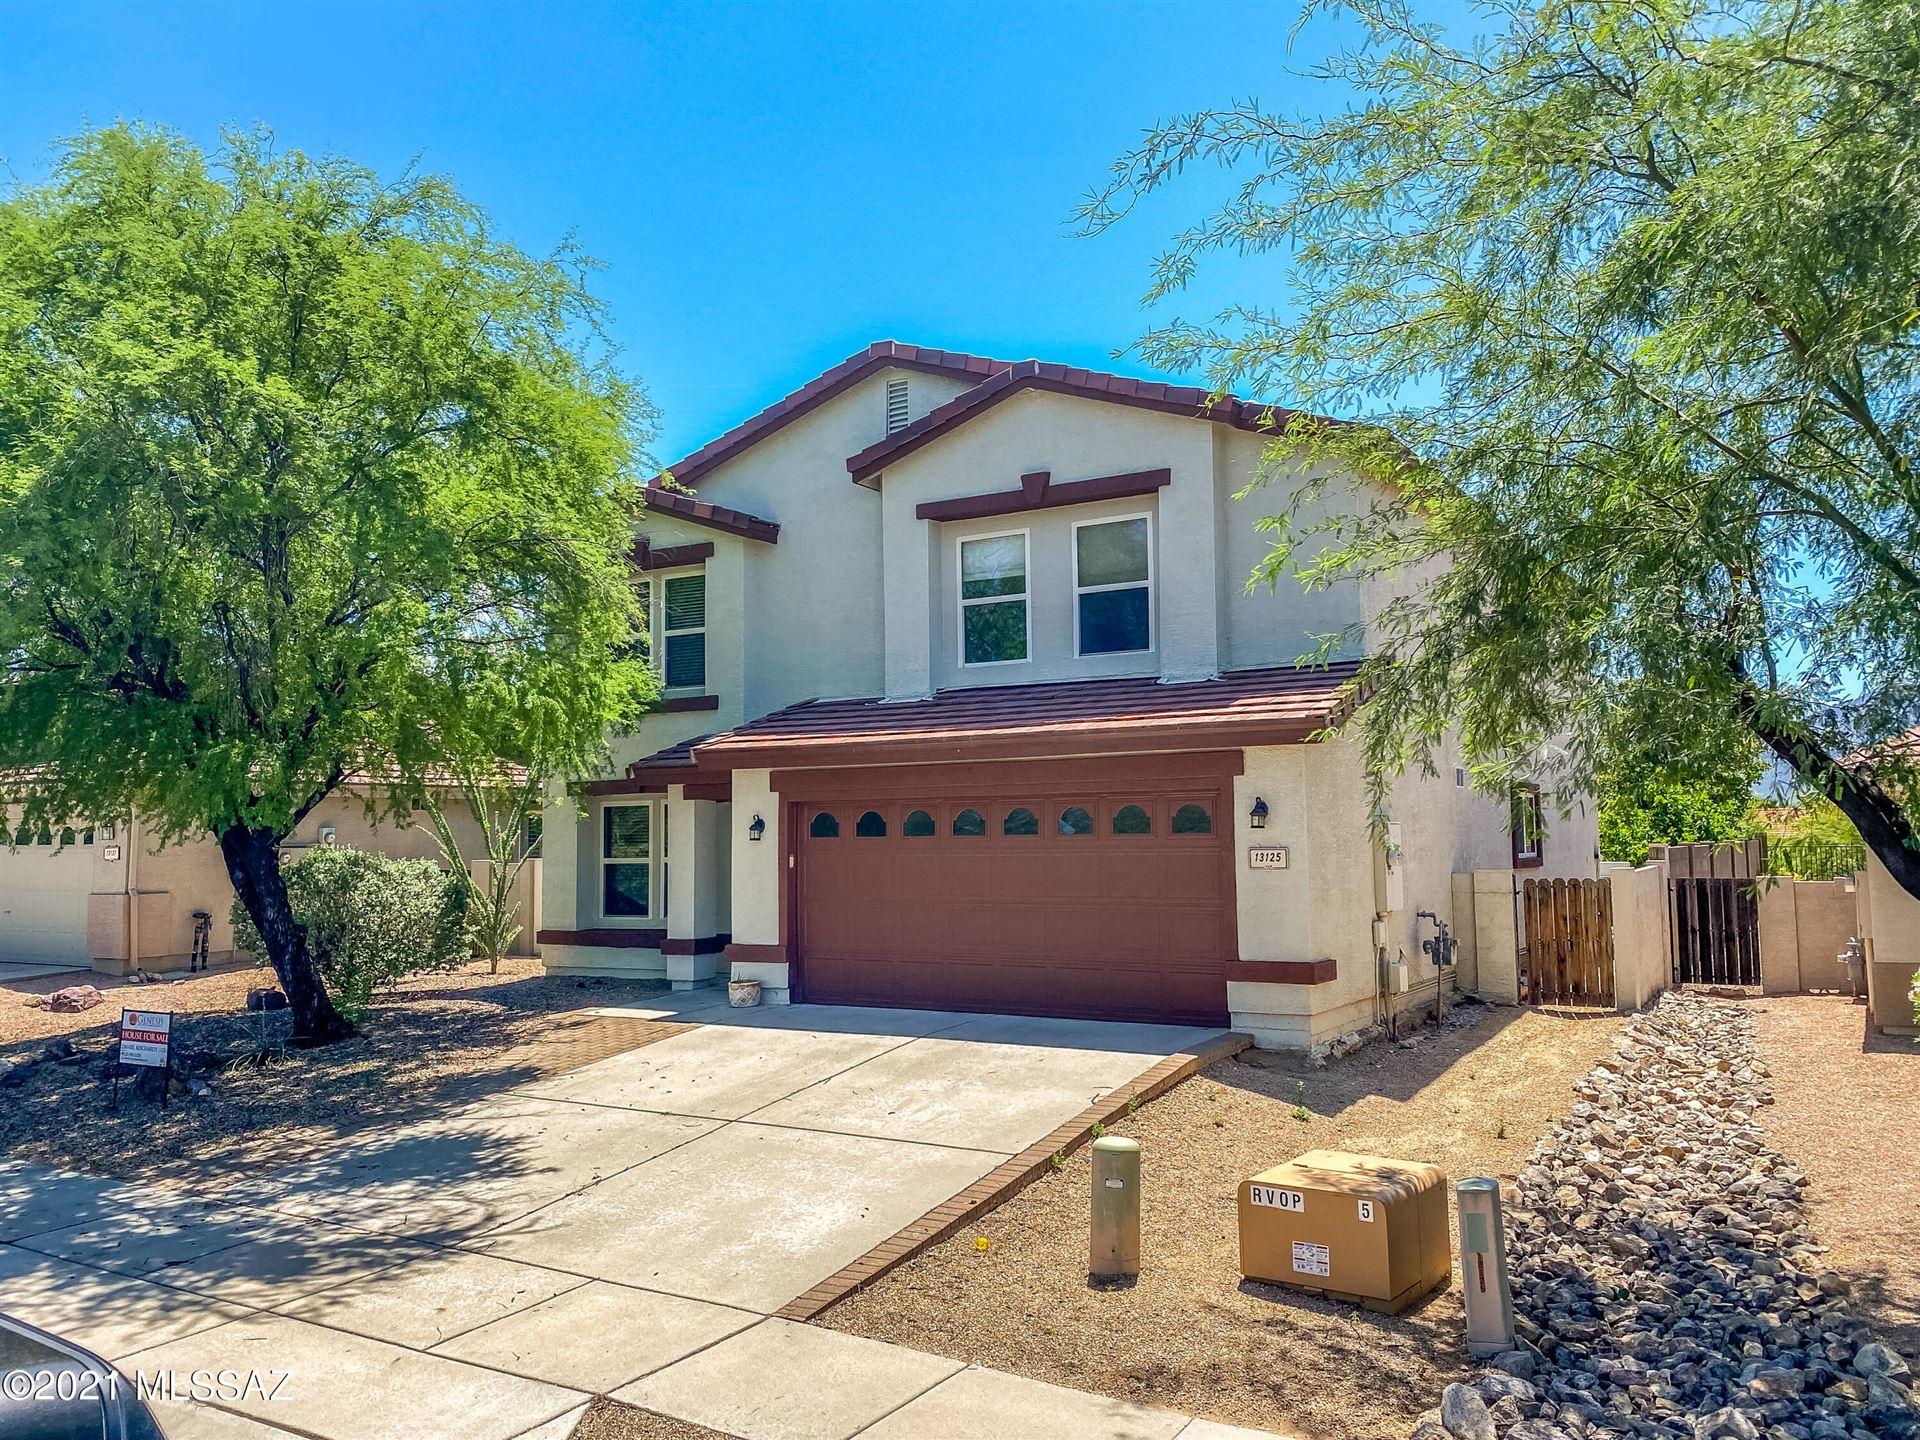 13125 N Tanner Robert Drive, Oro Valley, AZ 85755 - MLS#: 22117741